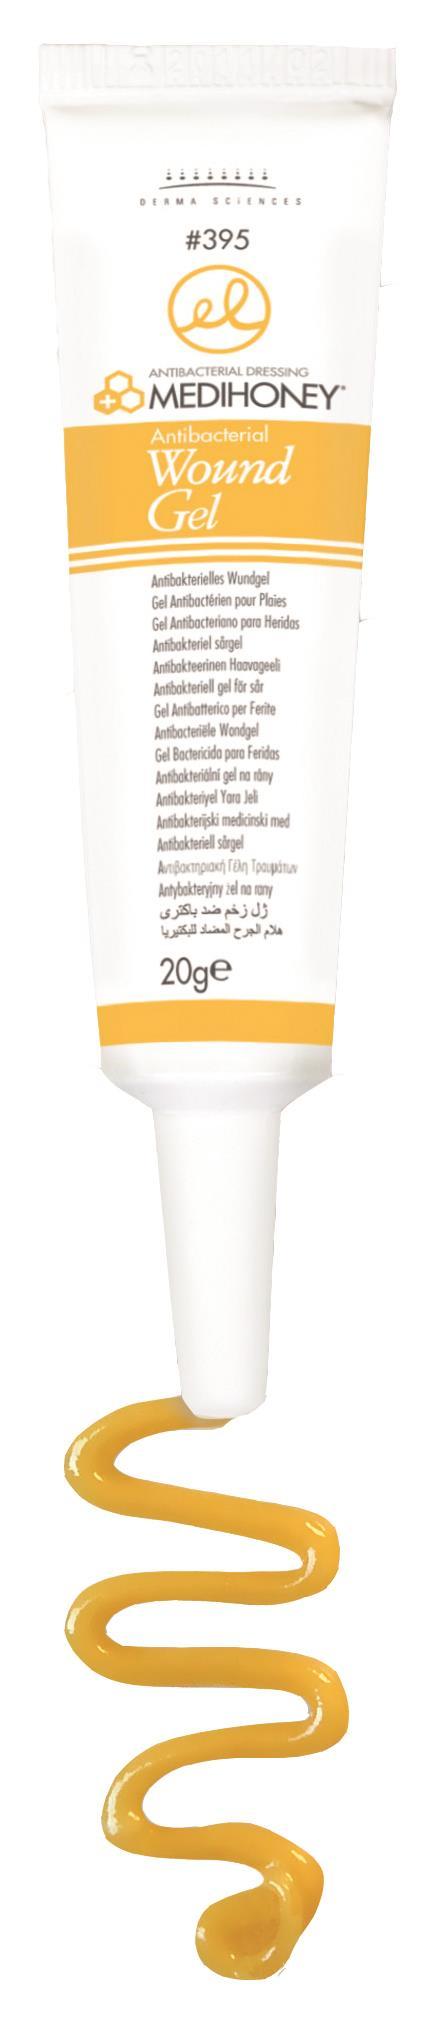 Medihoney® antibakterielles Wound Gel